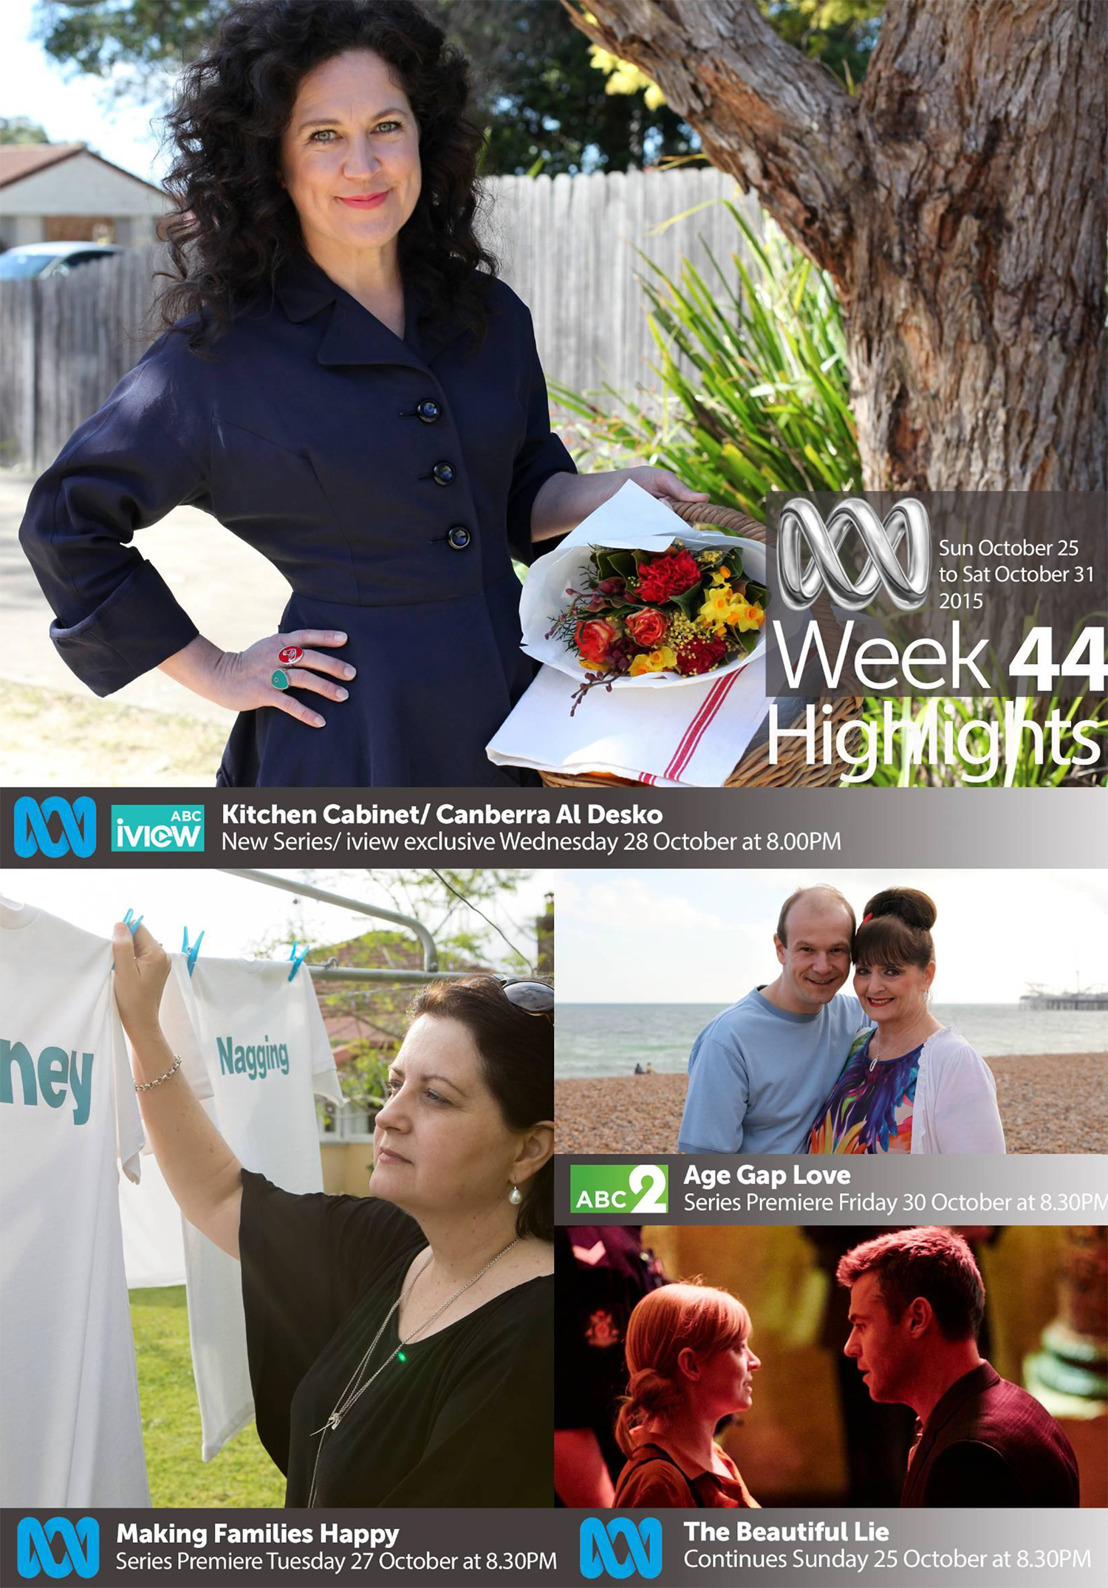 ABC TV Highlights - Week 44